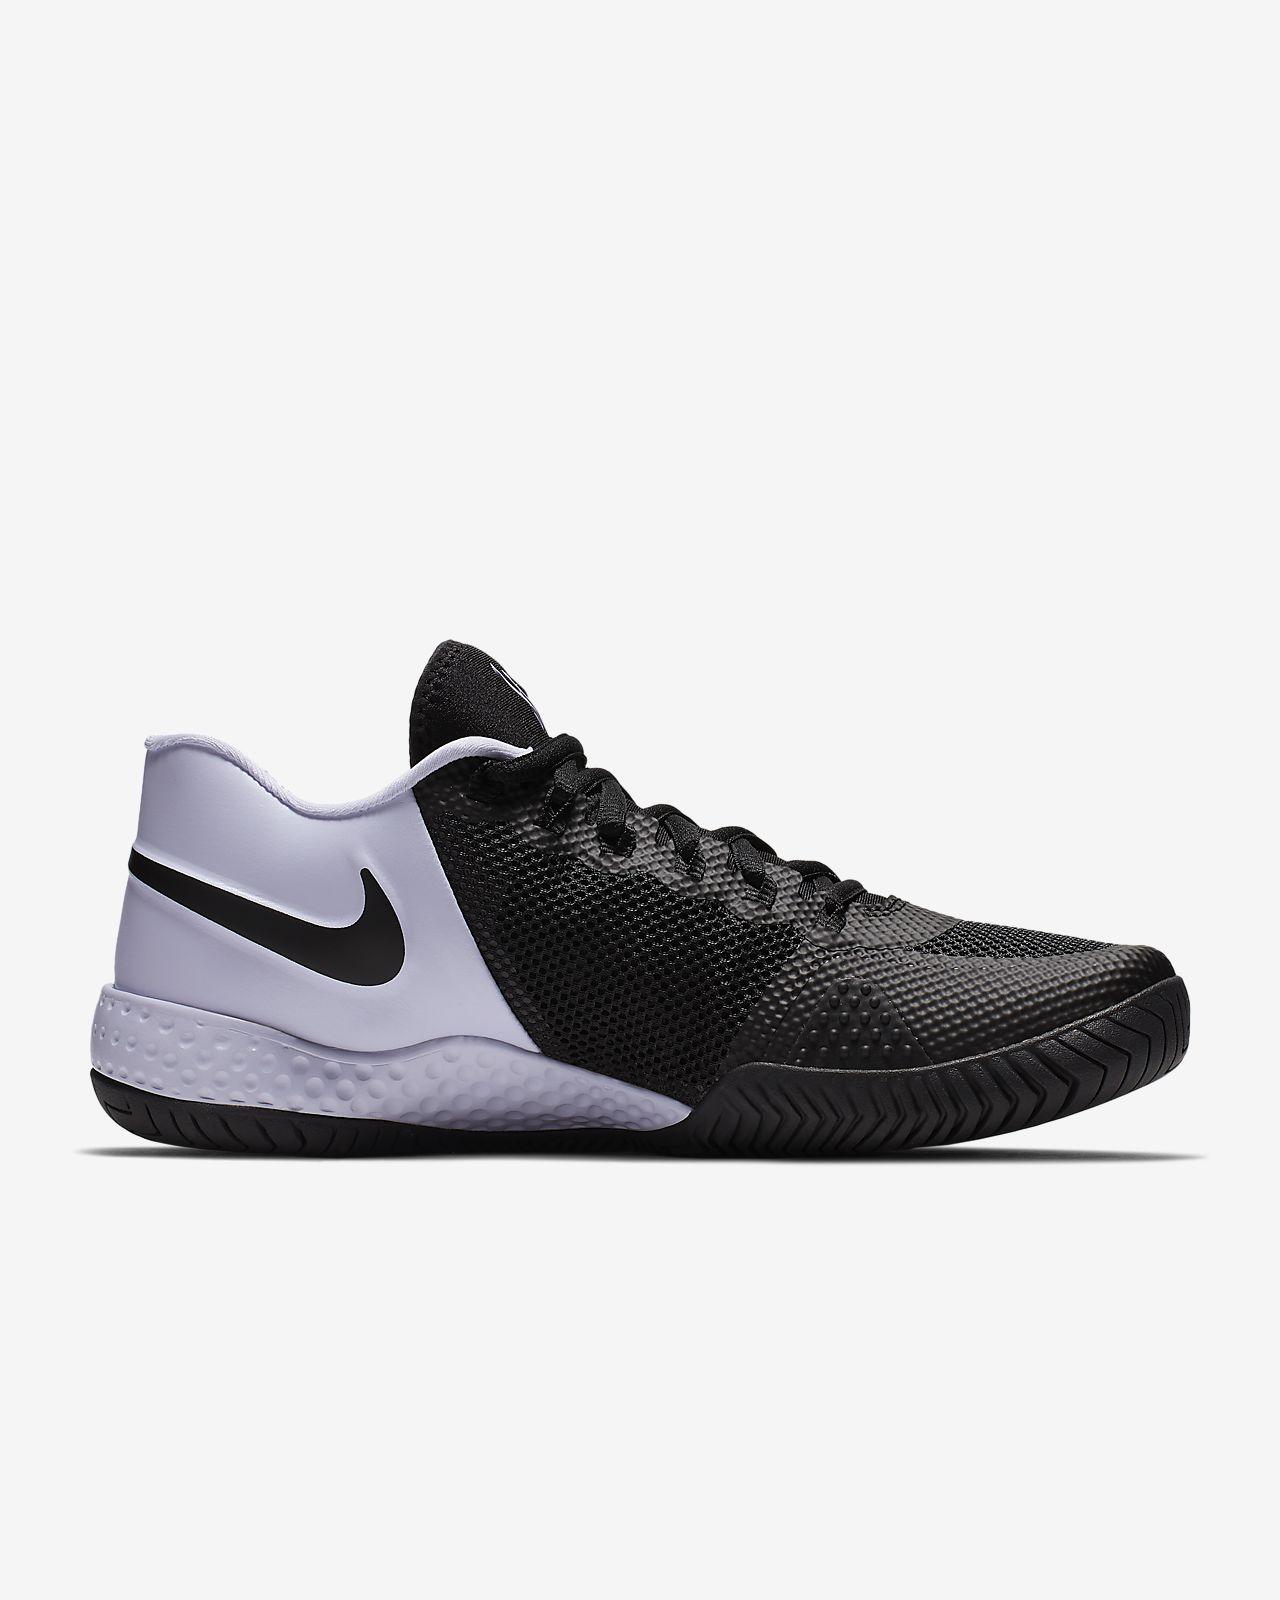 online retailer d7be4 8b354 ... NikeCourt Flare 2 Women s Hard Court Tennis Shoe